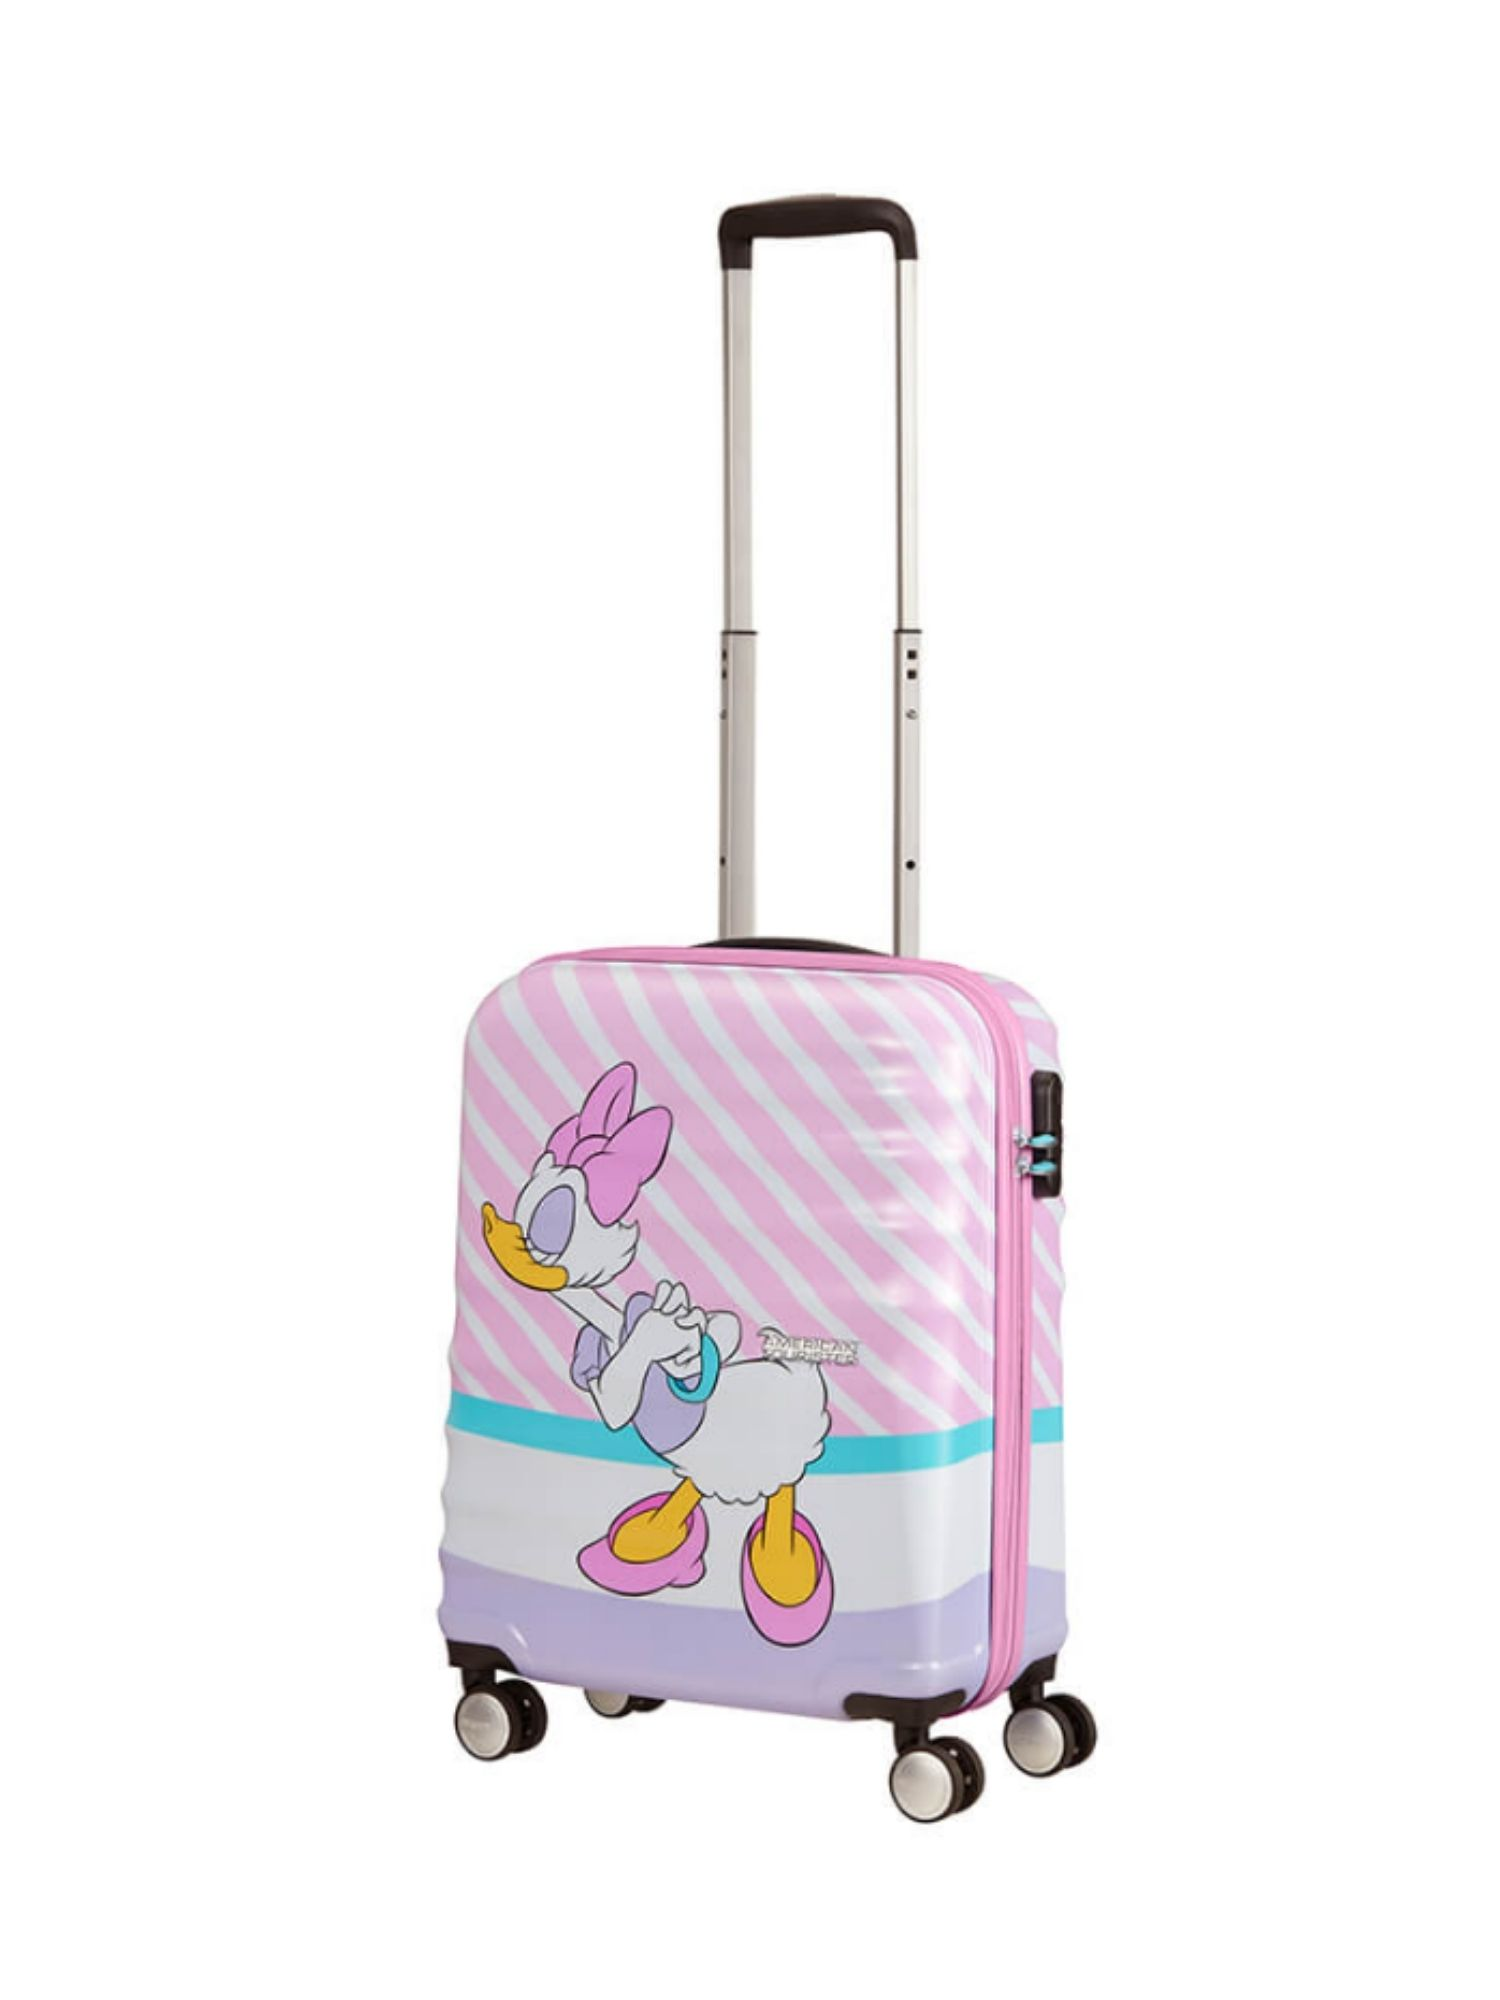 Trolley American Tourister 4 ruote 55 cm. Wavebreaker Disney Daisy Pink Kiss dettagli